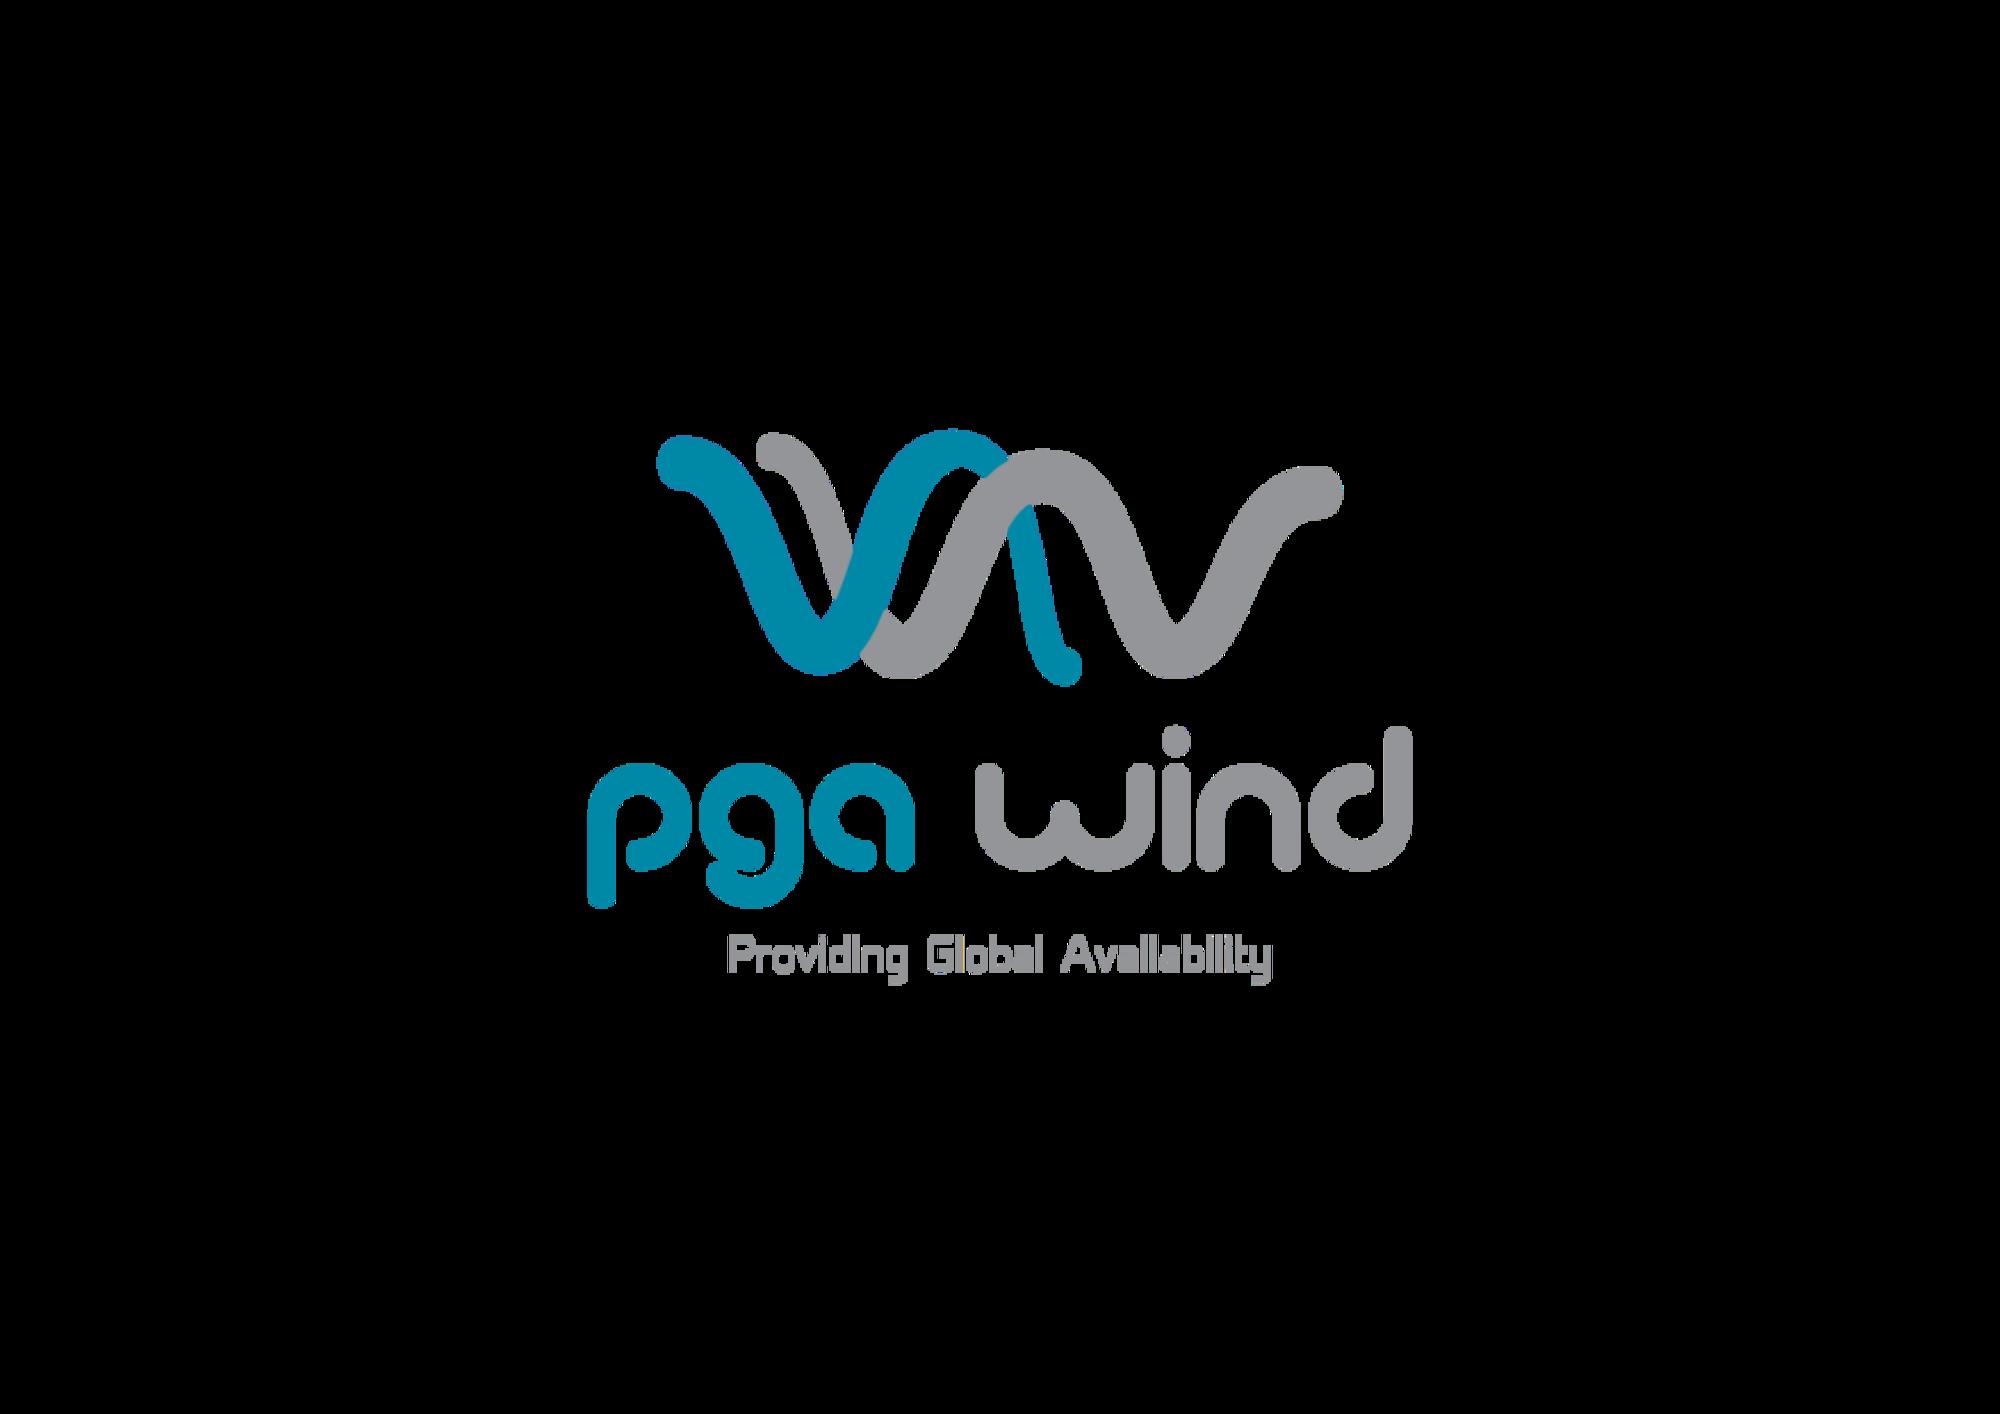 PGA WIND